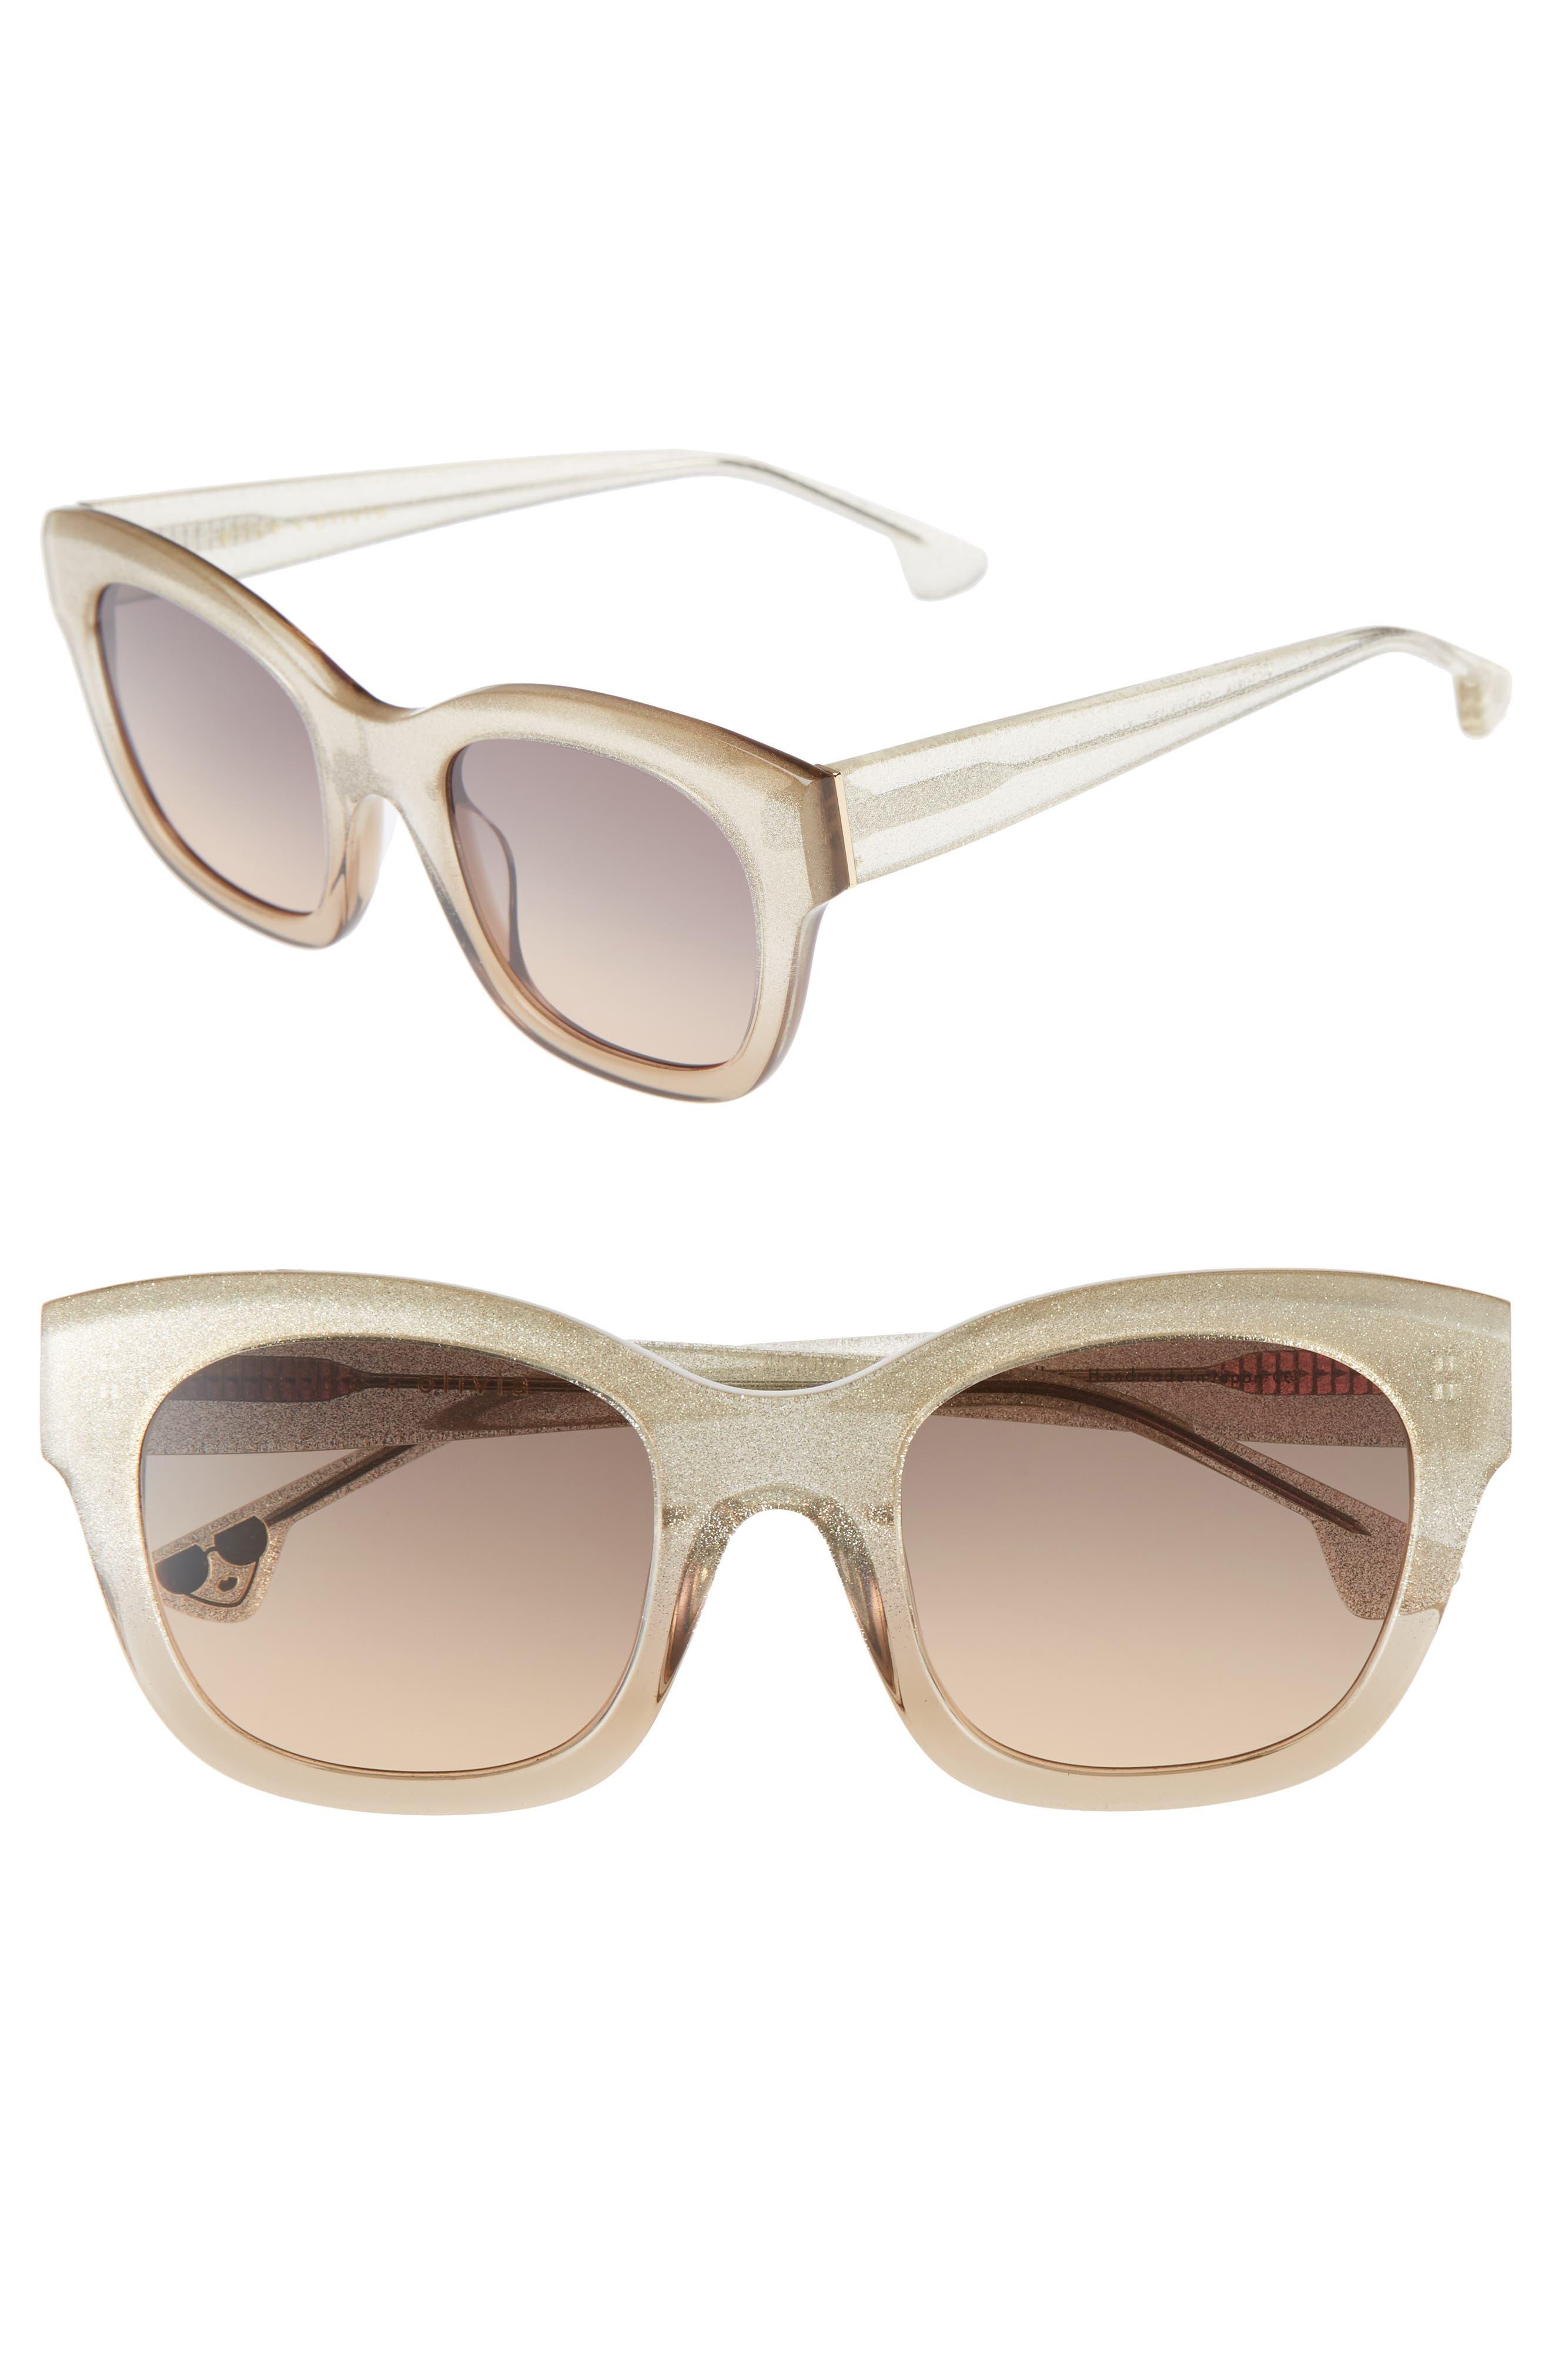 Victoria 50mm Cat Eye Sunglasses,                         Main,                         color, 001